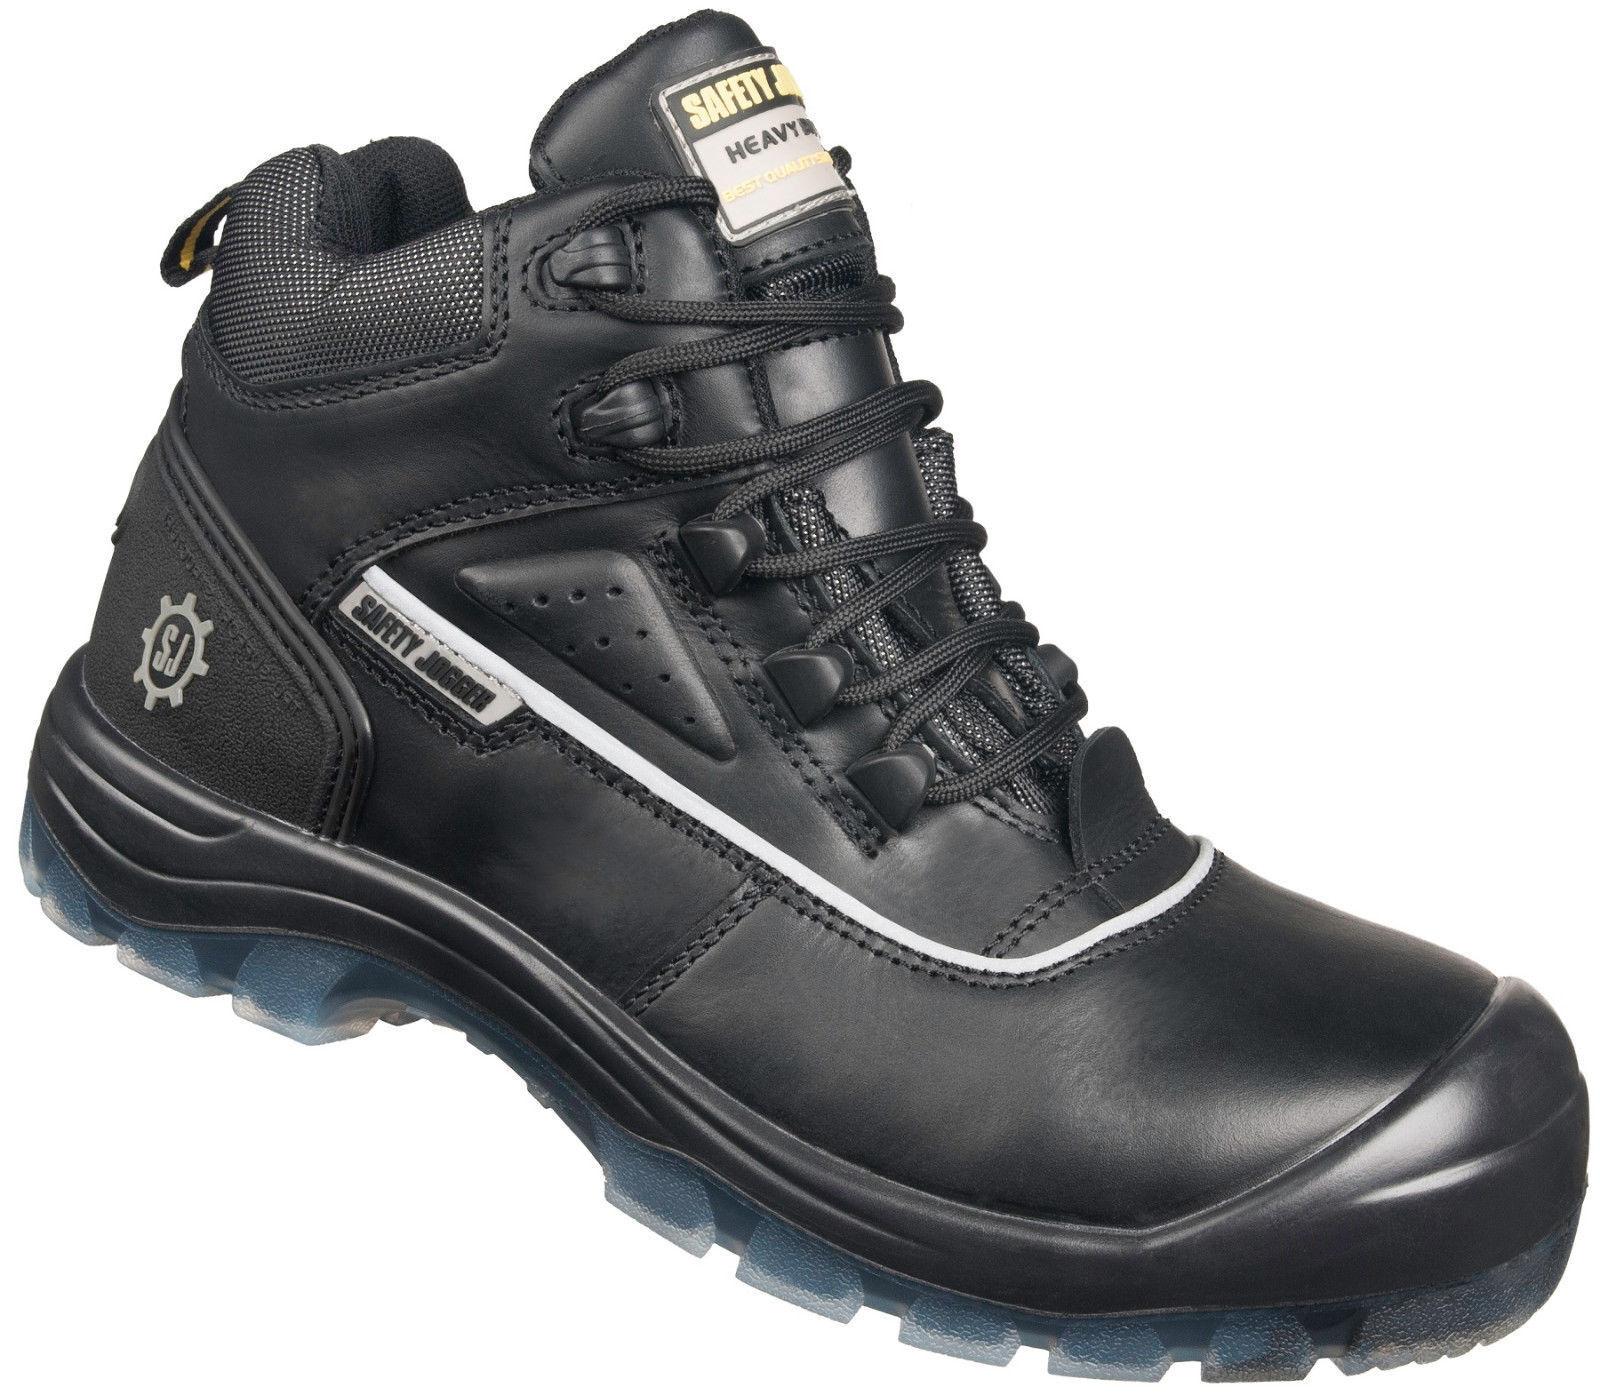 Men Work Boot Safety Jogger Cosmos Leather Black Black 100% Original Brand New